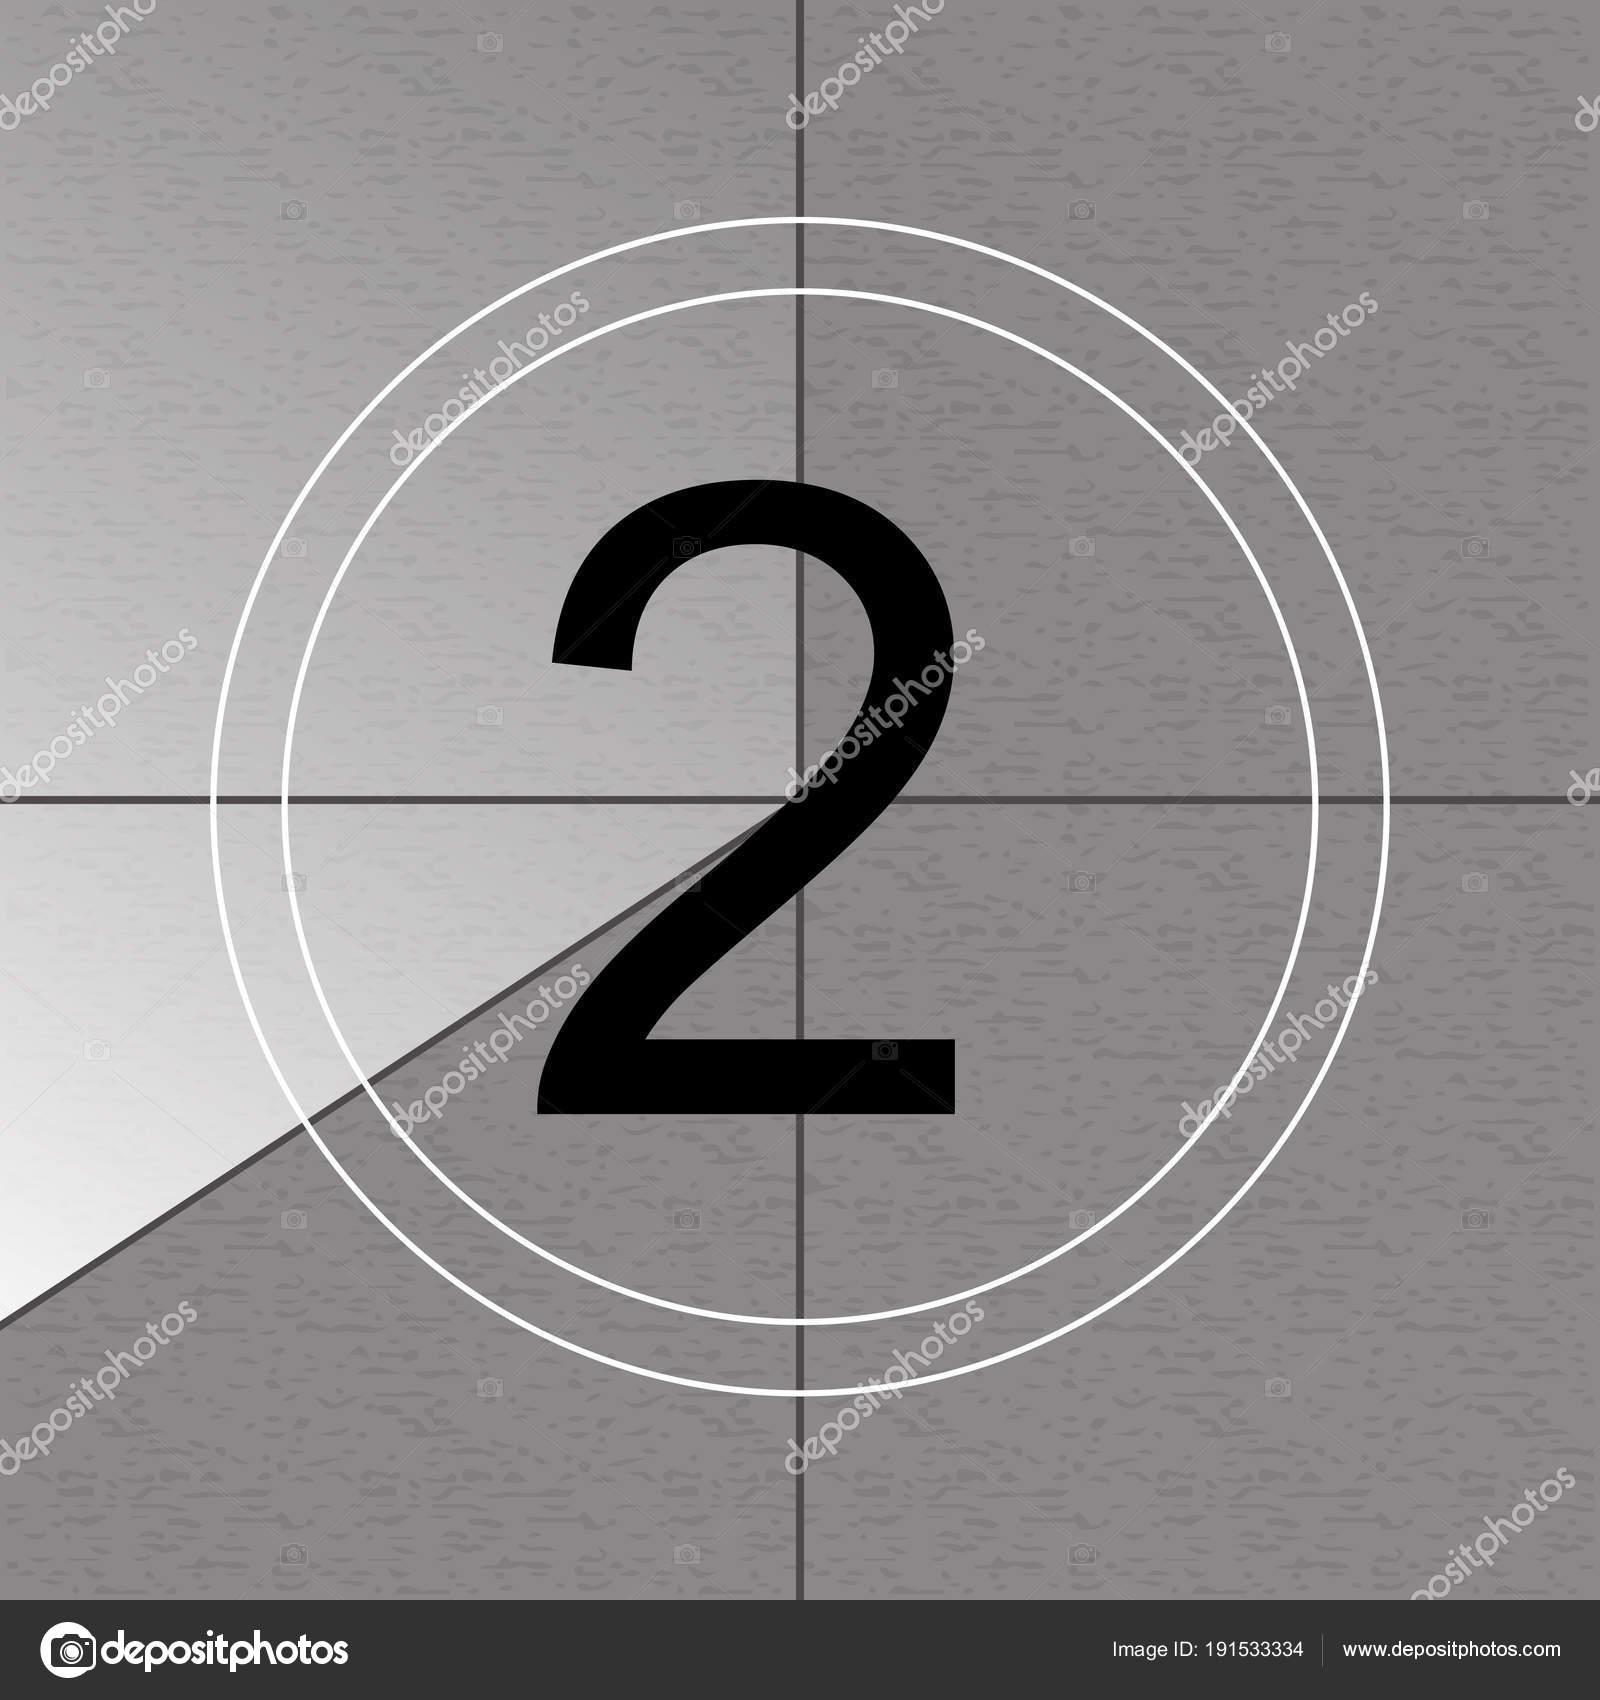 Kreative Vektor-Illustration des Countdown-Frames. Art-Design. Alte ...